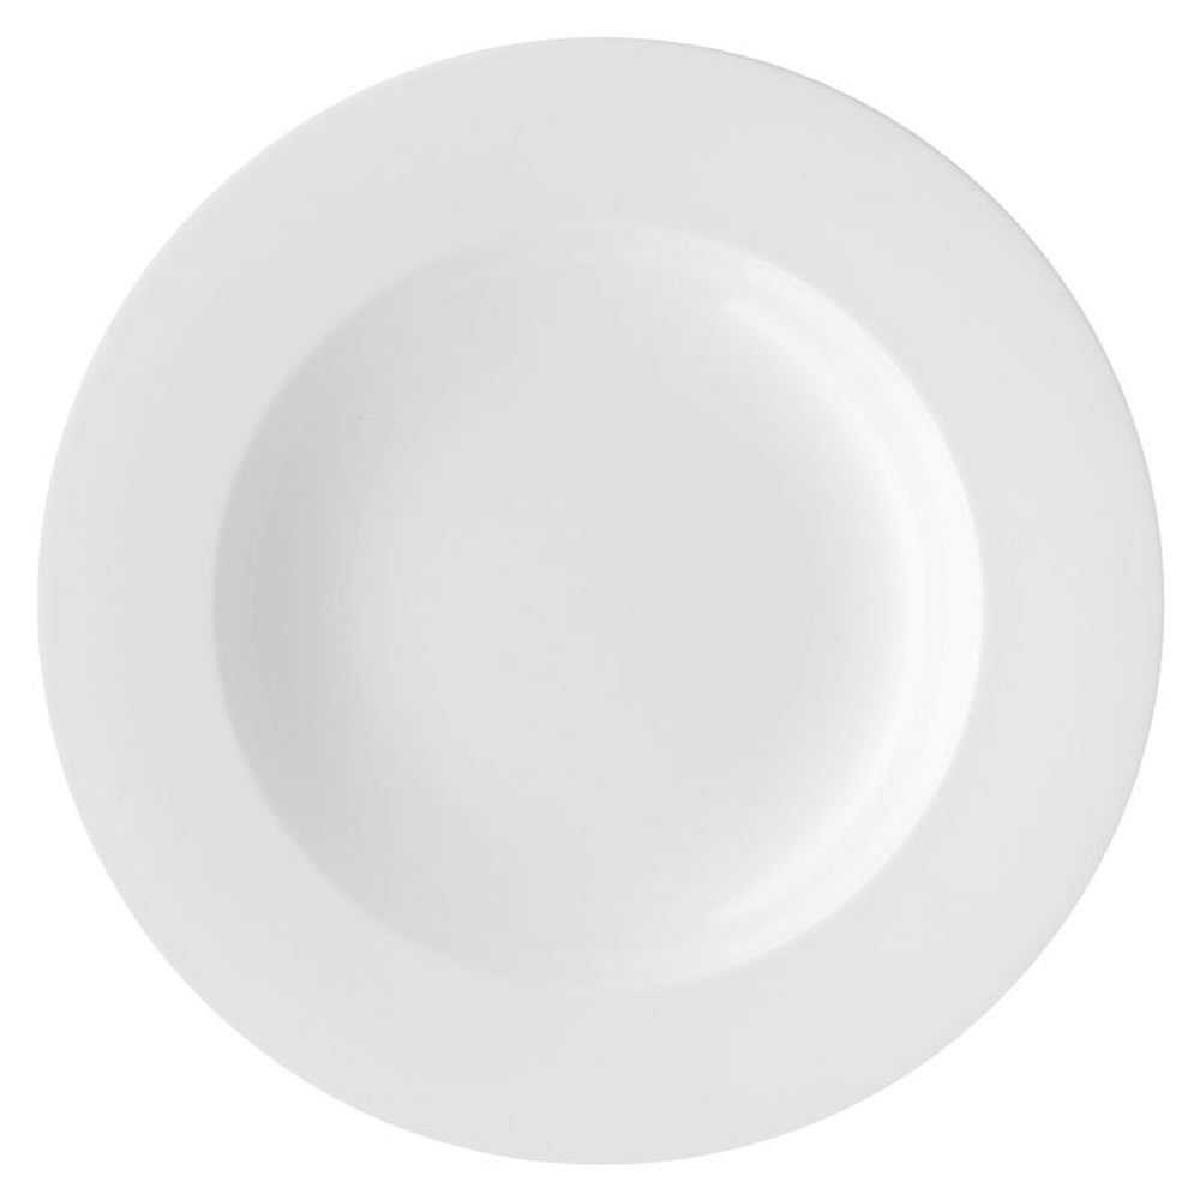 Онлайн каталог PROMENU: Тарелка глубокая фарфоровая Rosenthal JADE, диаметр 23 см, белый Rosenthal 61040-800001-10123